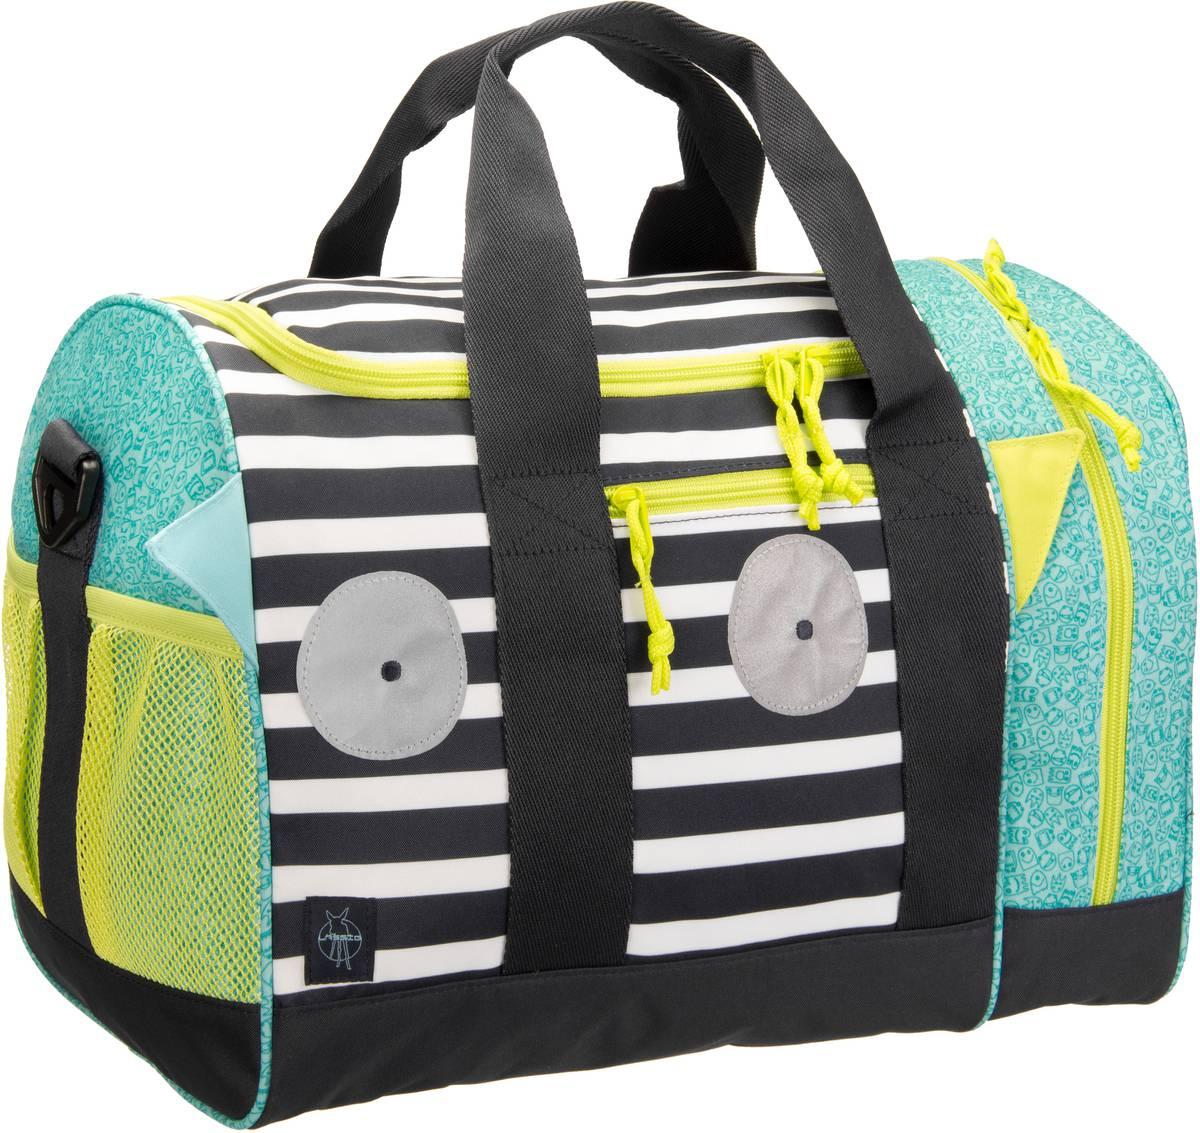 Guhrow Angebote Lässig 4Kids Mini Sportbag Little Monsters - Bouncing Bob Reisegepäck für Kinder